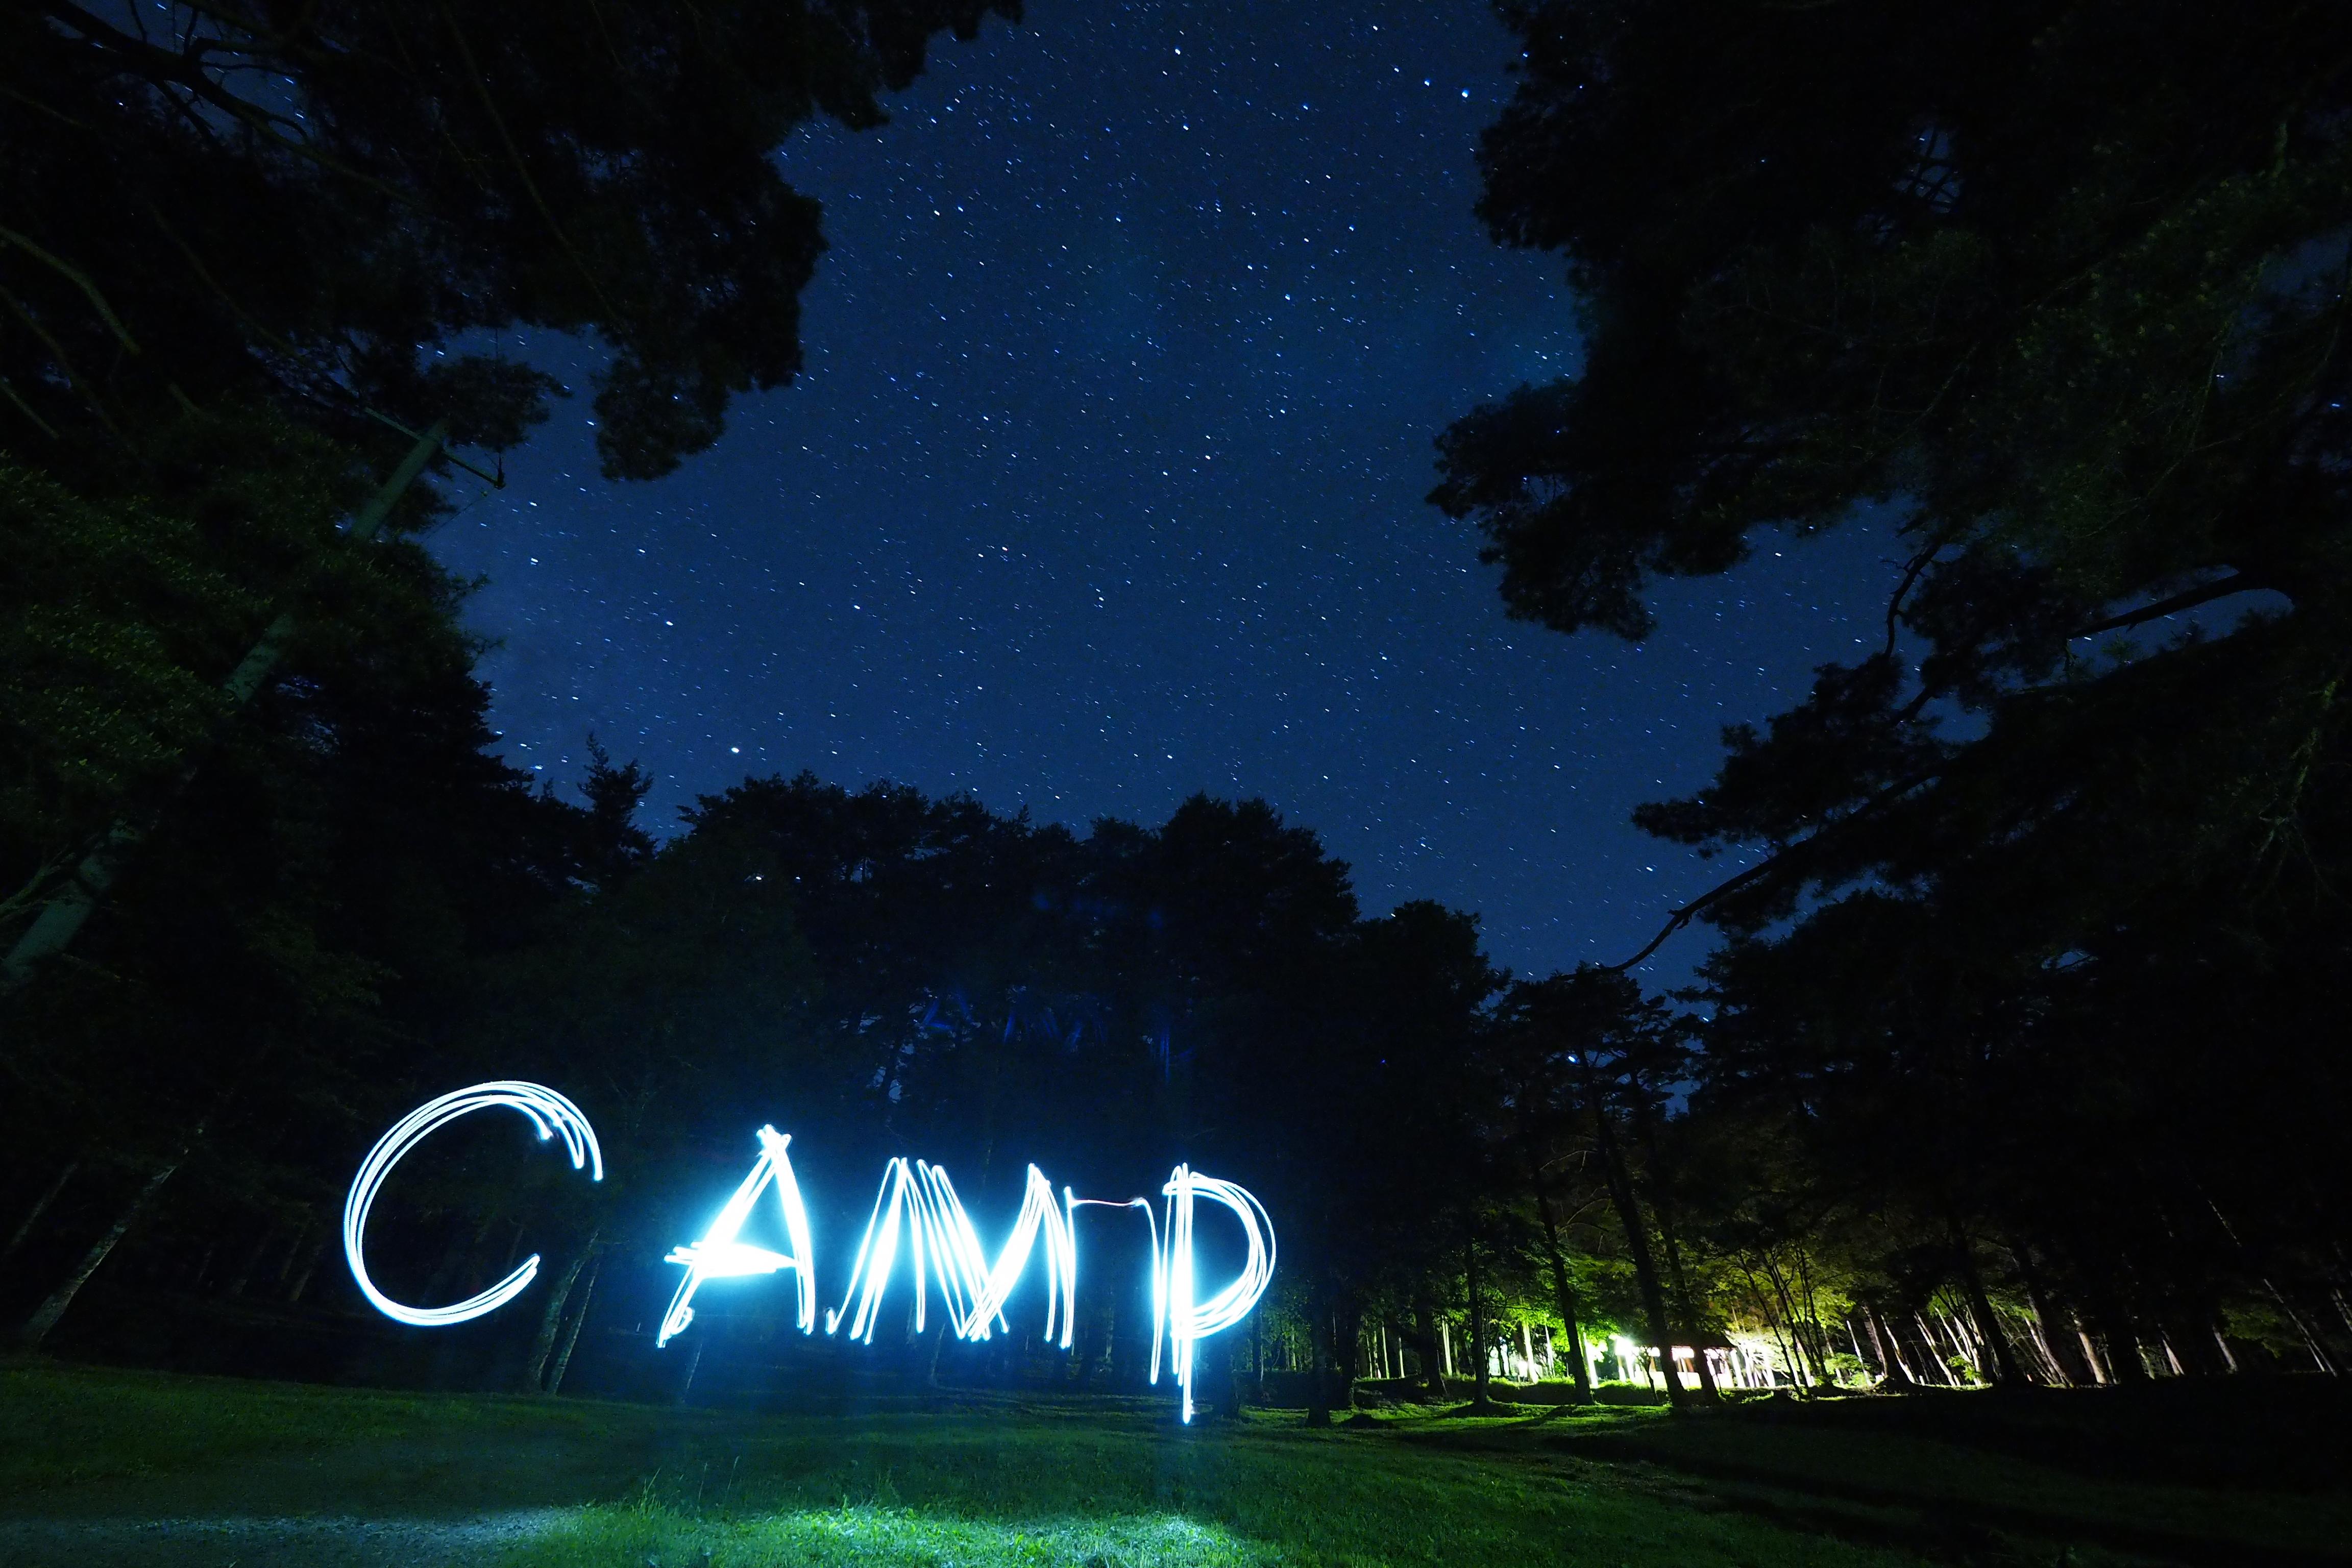 PDF:平成28年度のキャンプサイト営業時期について